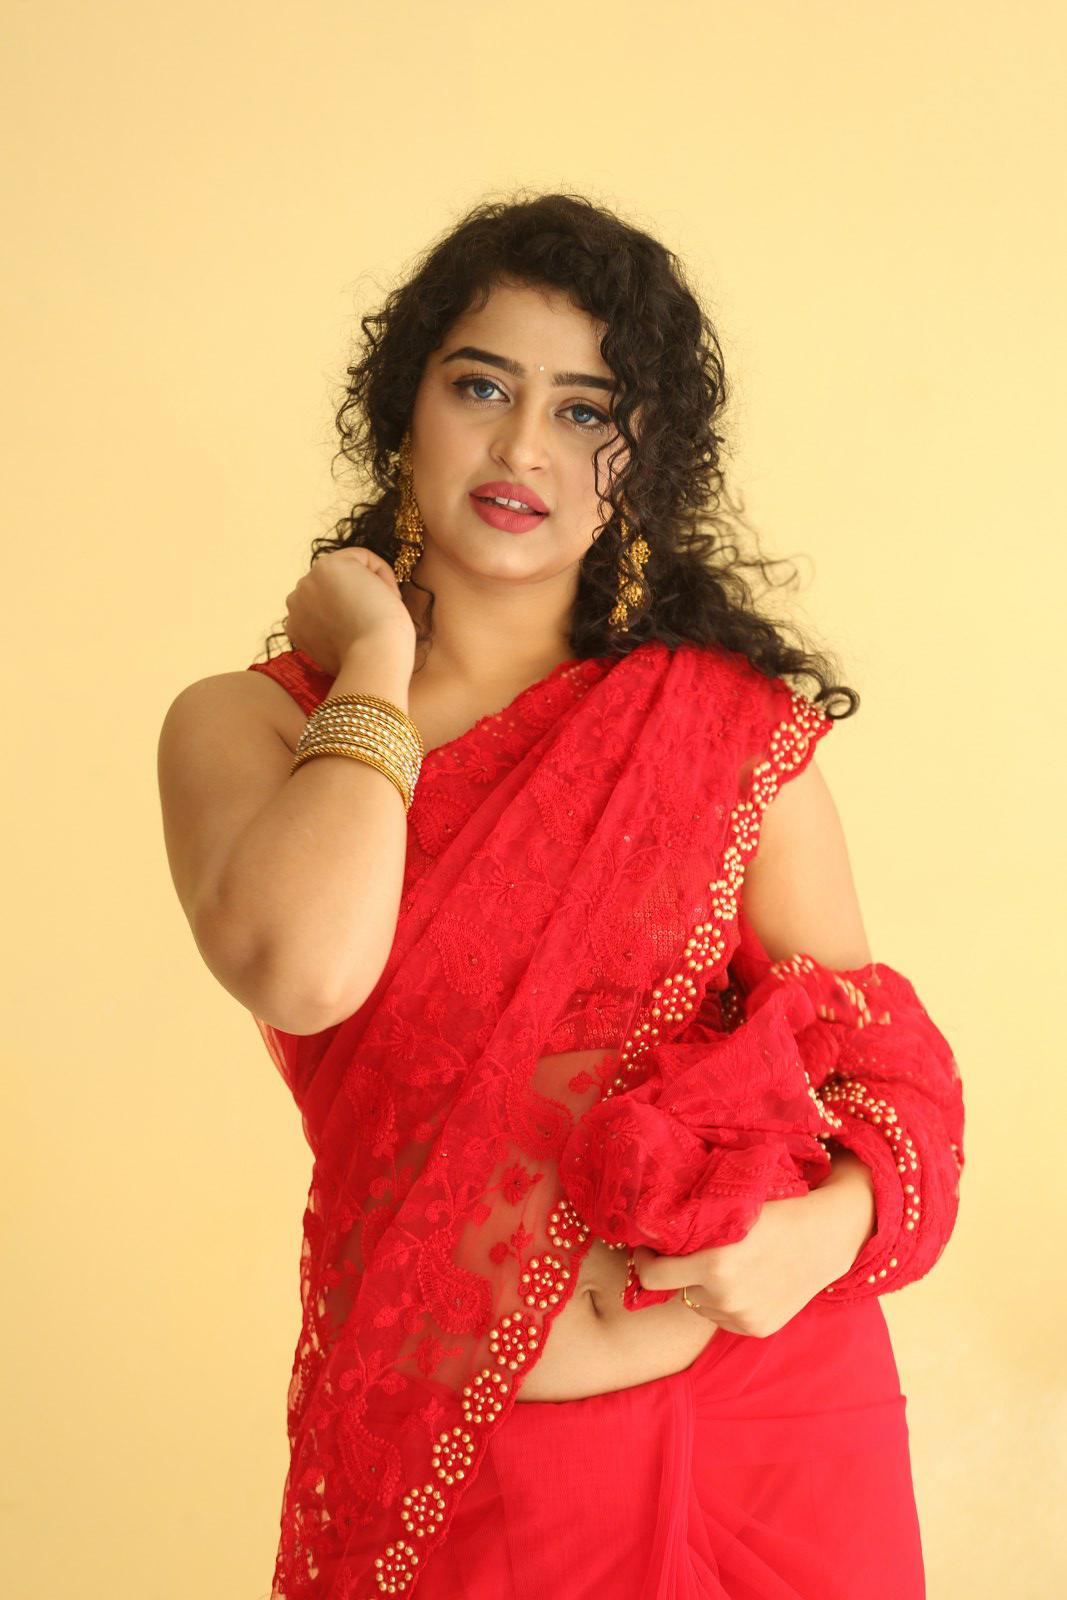 Ullala Ullala movie Actress Anketa Maharana Stills